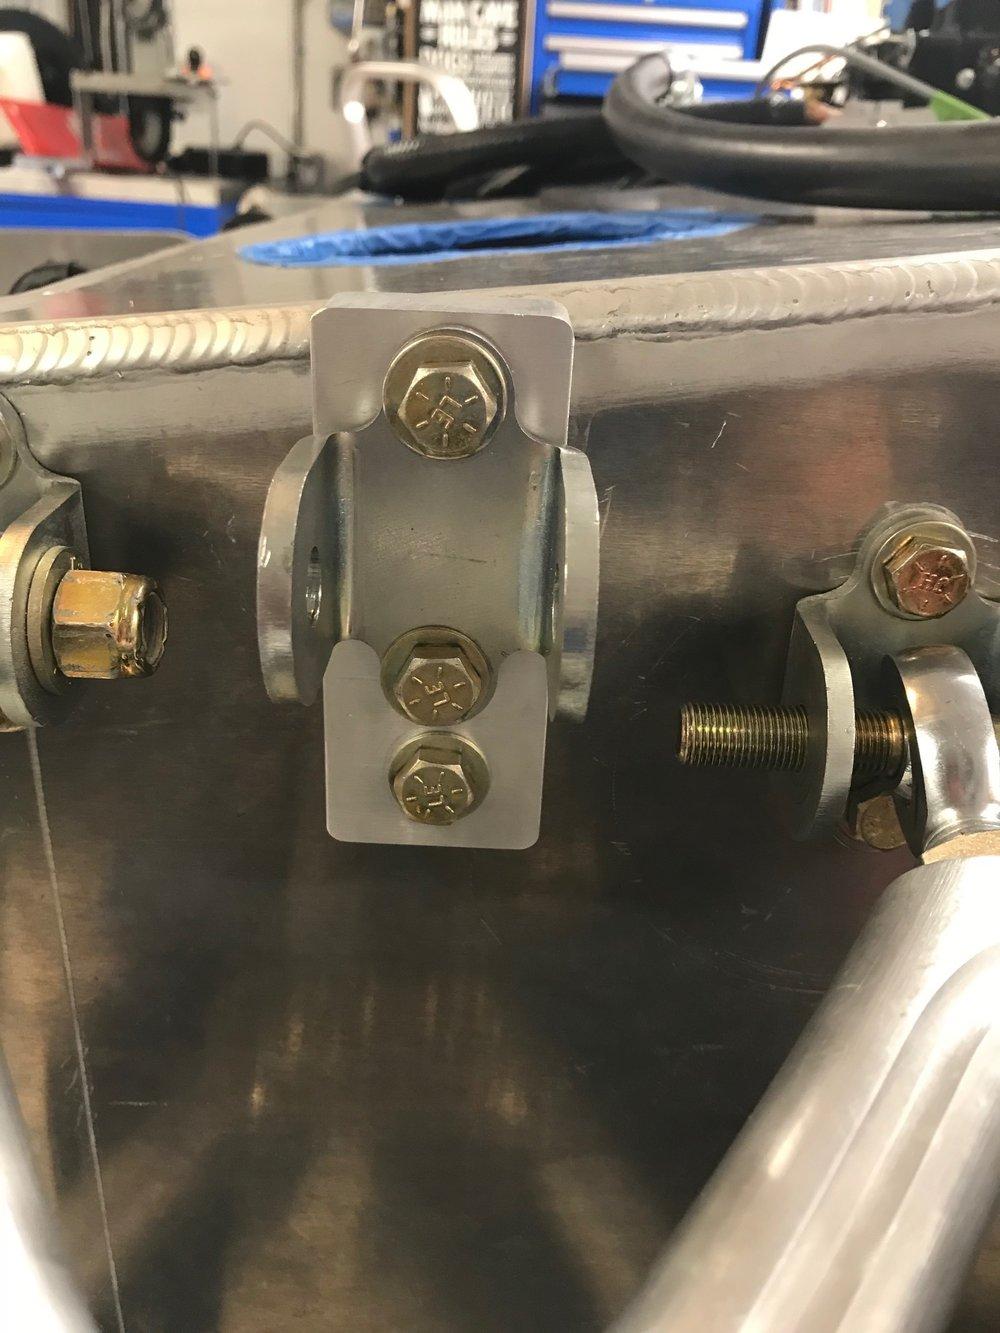 Bracket mounted to spacer